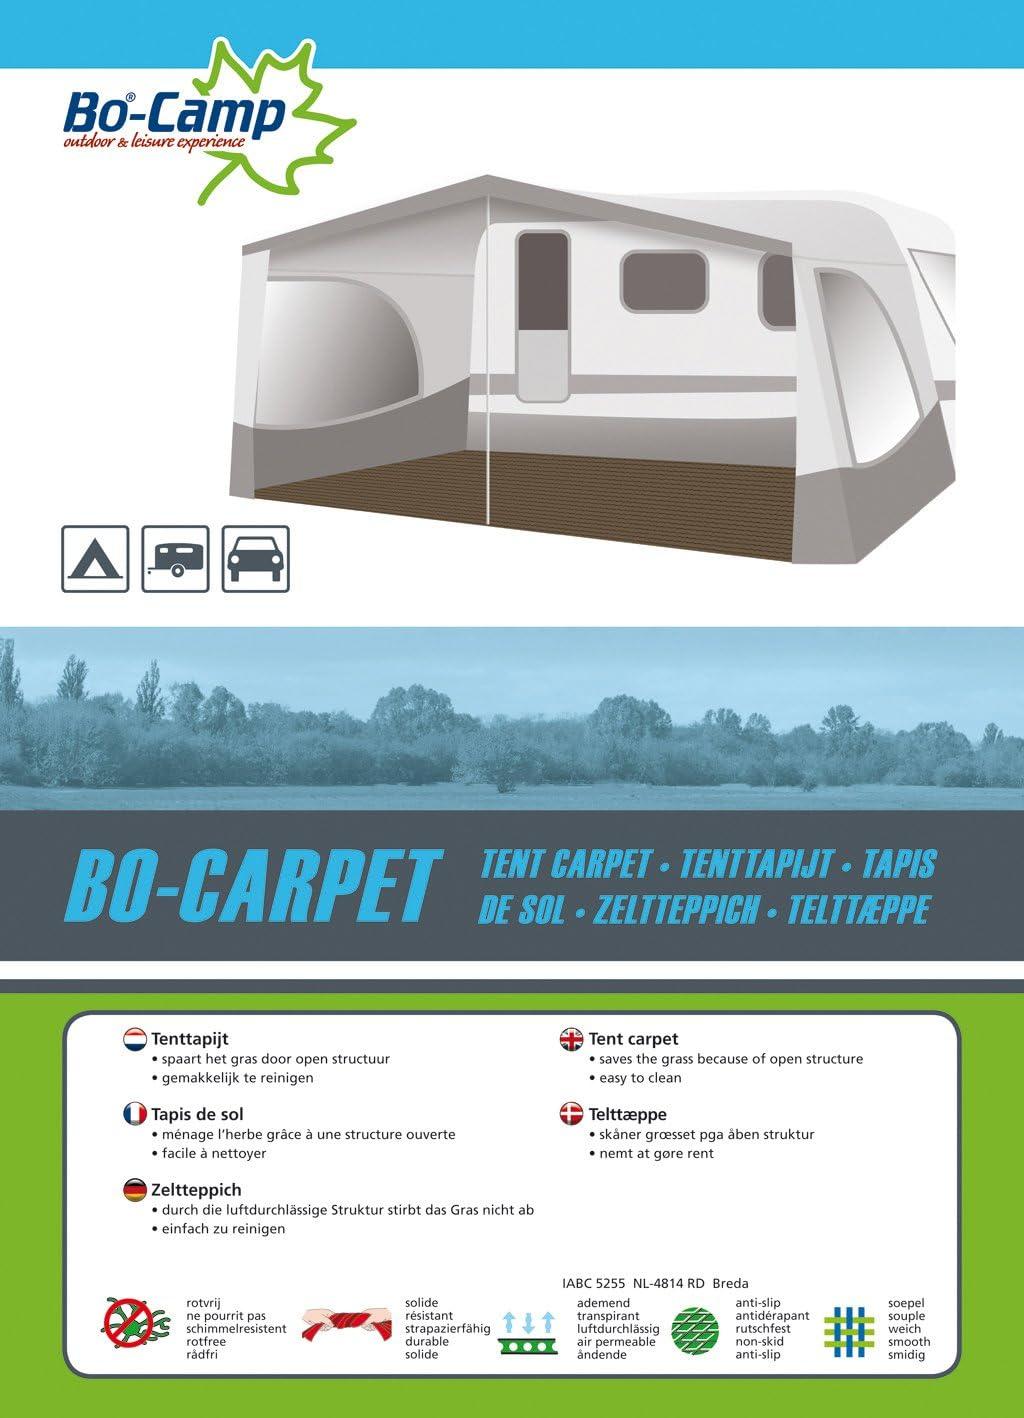 Bo-Camp Zeltteppich Vorzelt Teppich Camping Zeltboden Outdoor Zelt Teppich 2 bis 6 m